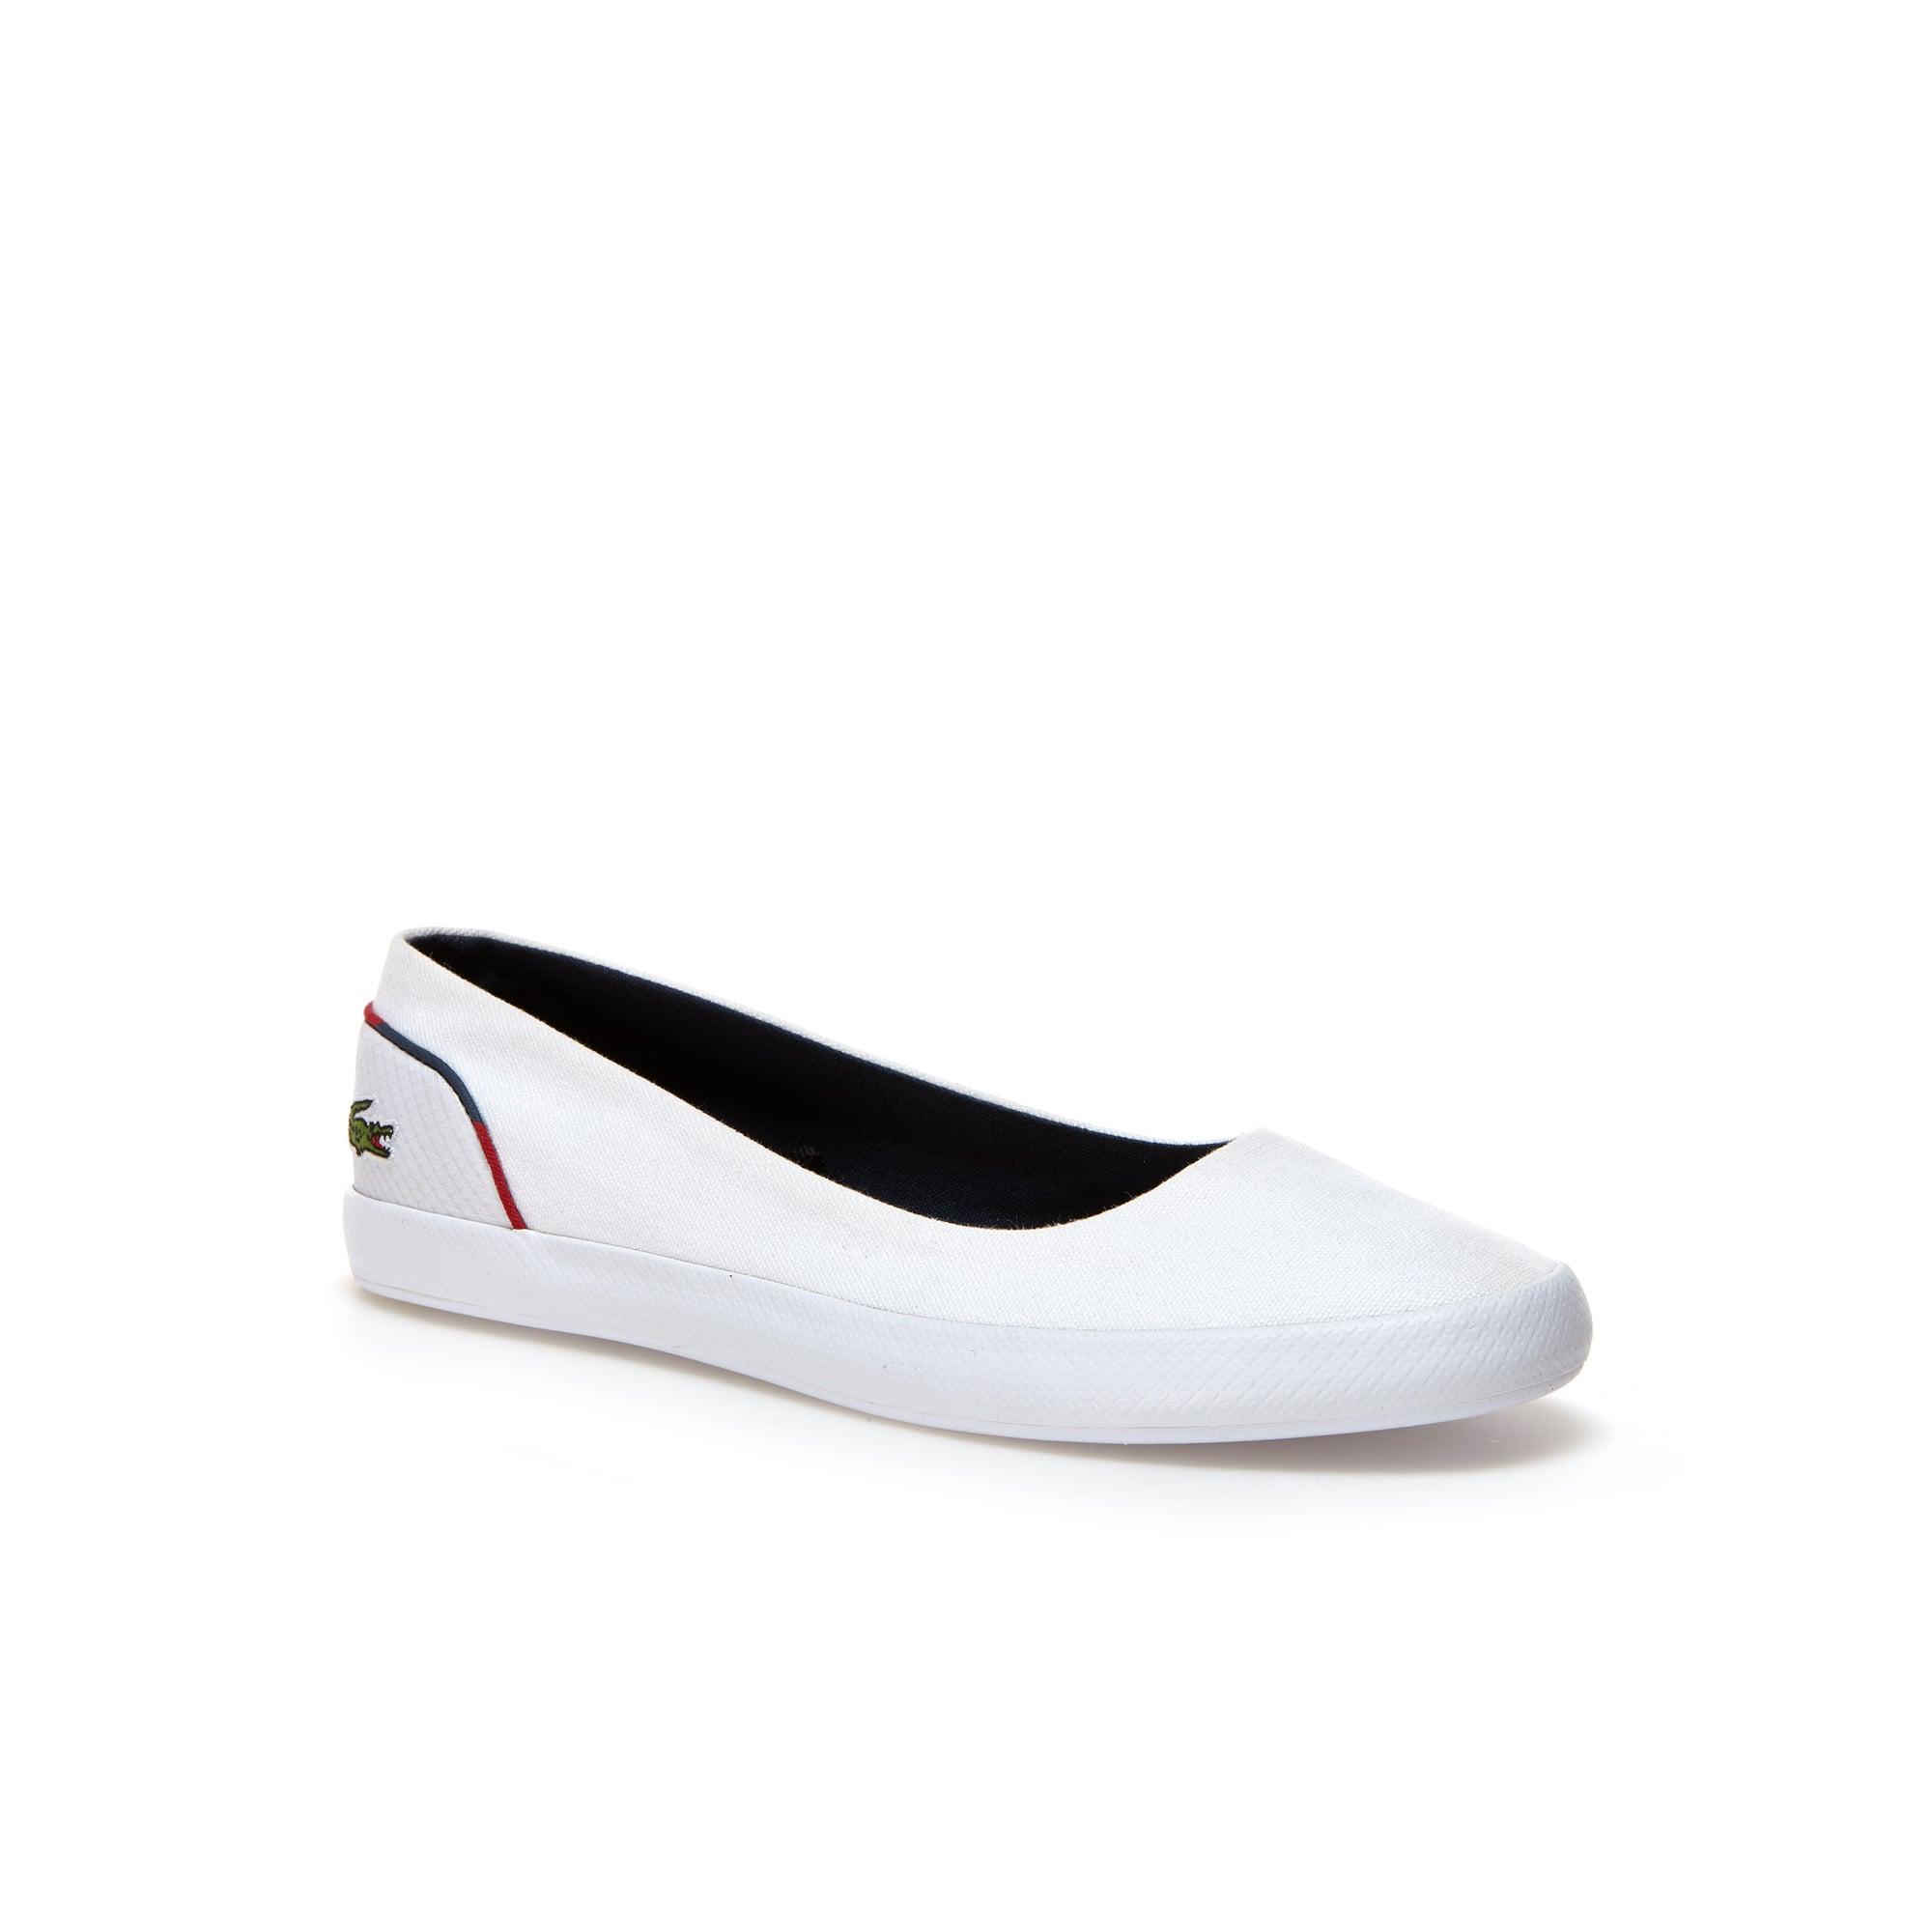 Sneakers senza stringhe da donna Lancelle Ballerina in tela